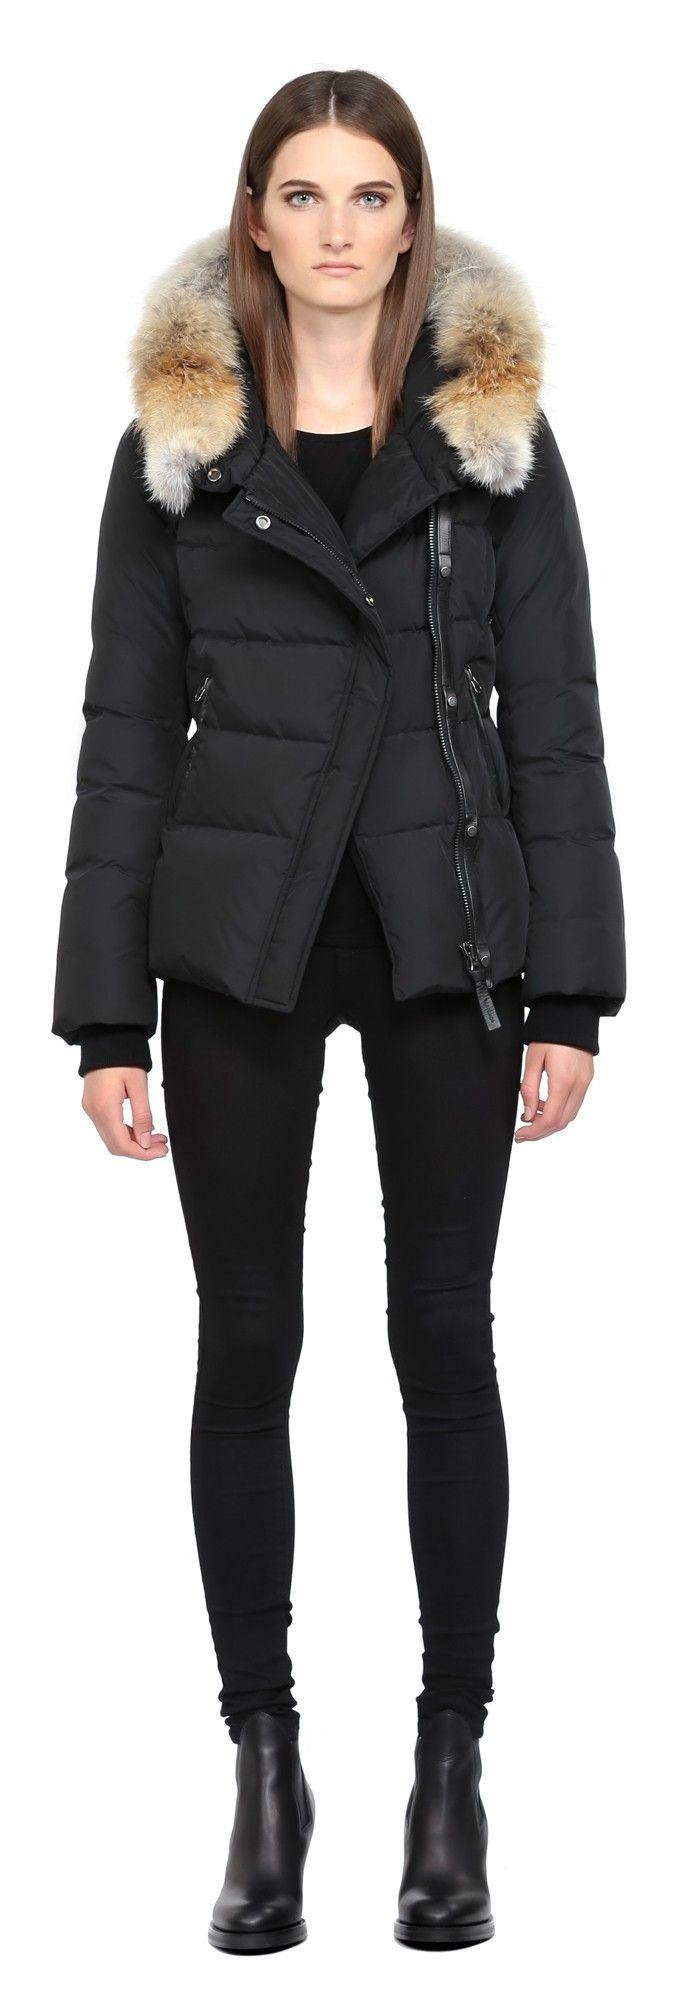 Adi Black Bomber Jacket With Fur Hood For Women Mackage Black Bomber Jacket Fur Hood Jacket Jackets [ 2000 x 683 Pixel ]